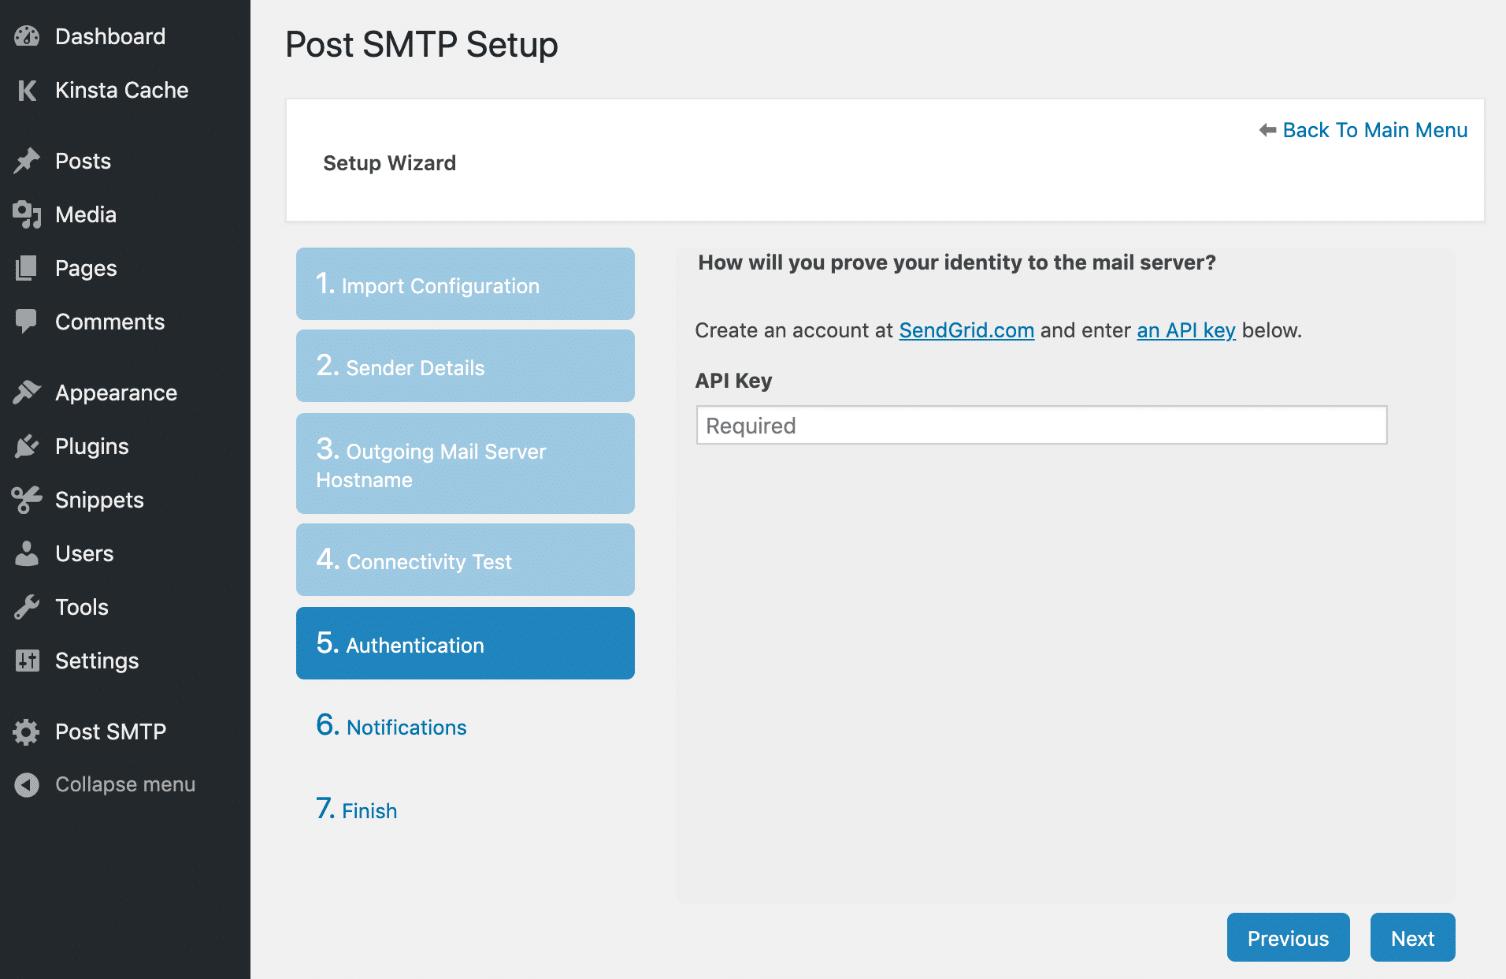 Post SMTPでのSendGridのAPIキー